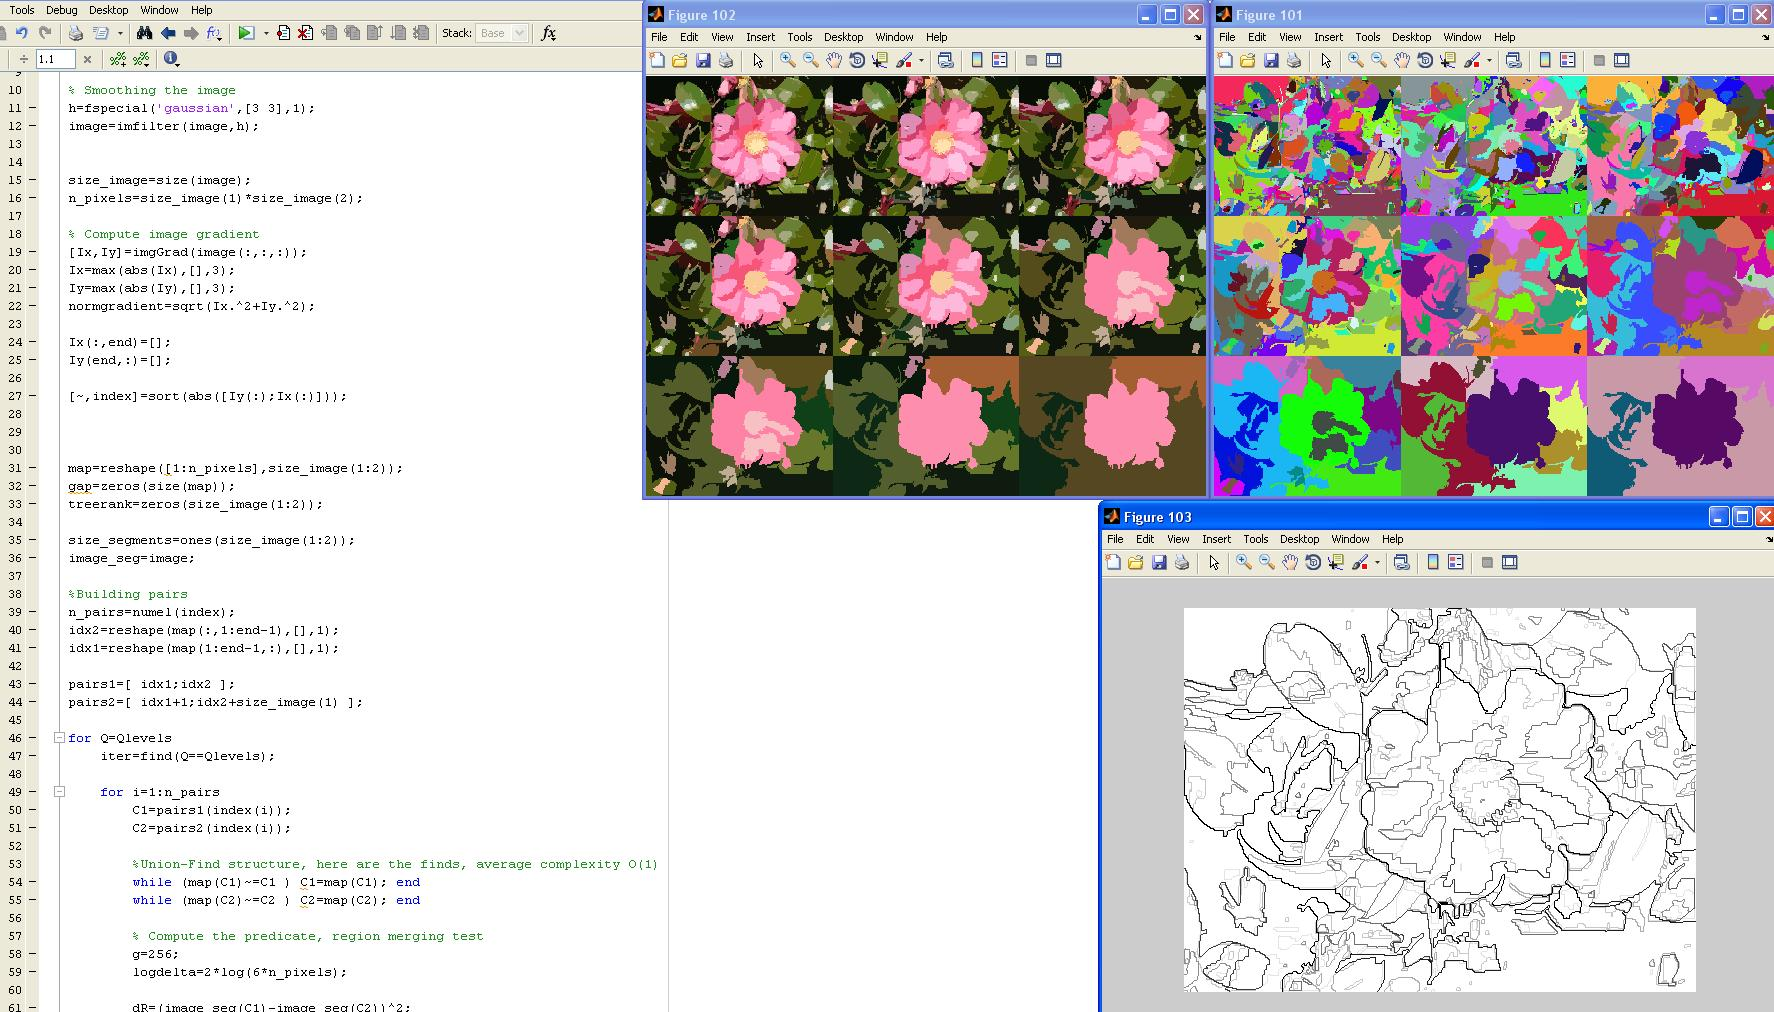 Image segmentation using statistical region merging - File